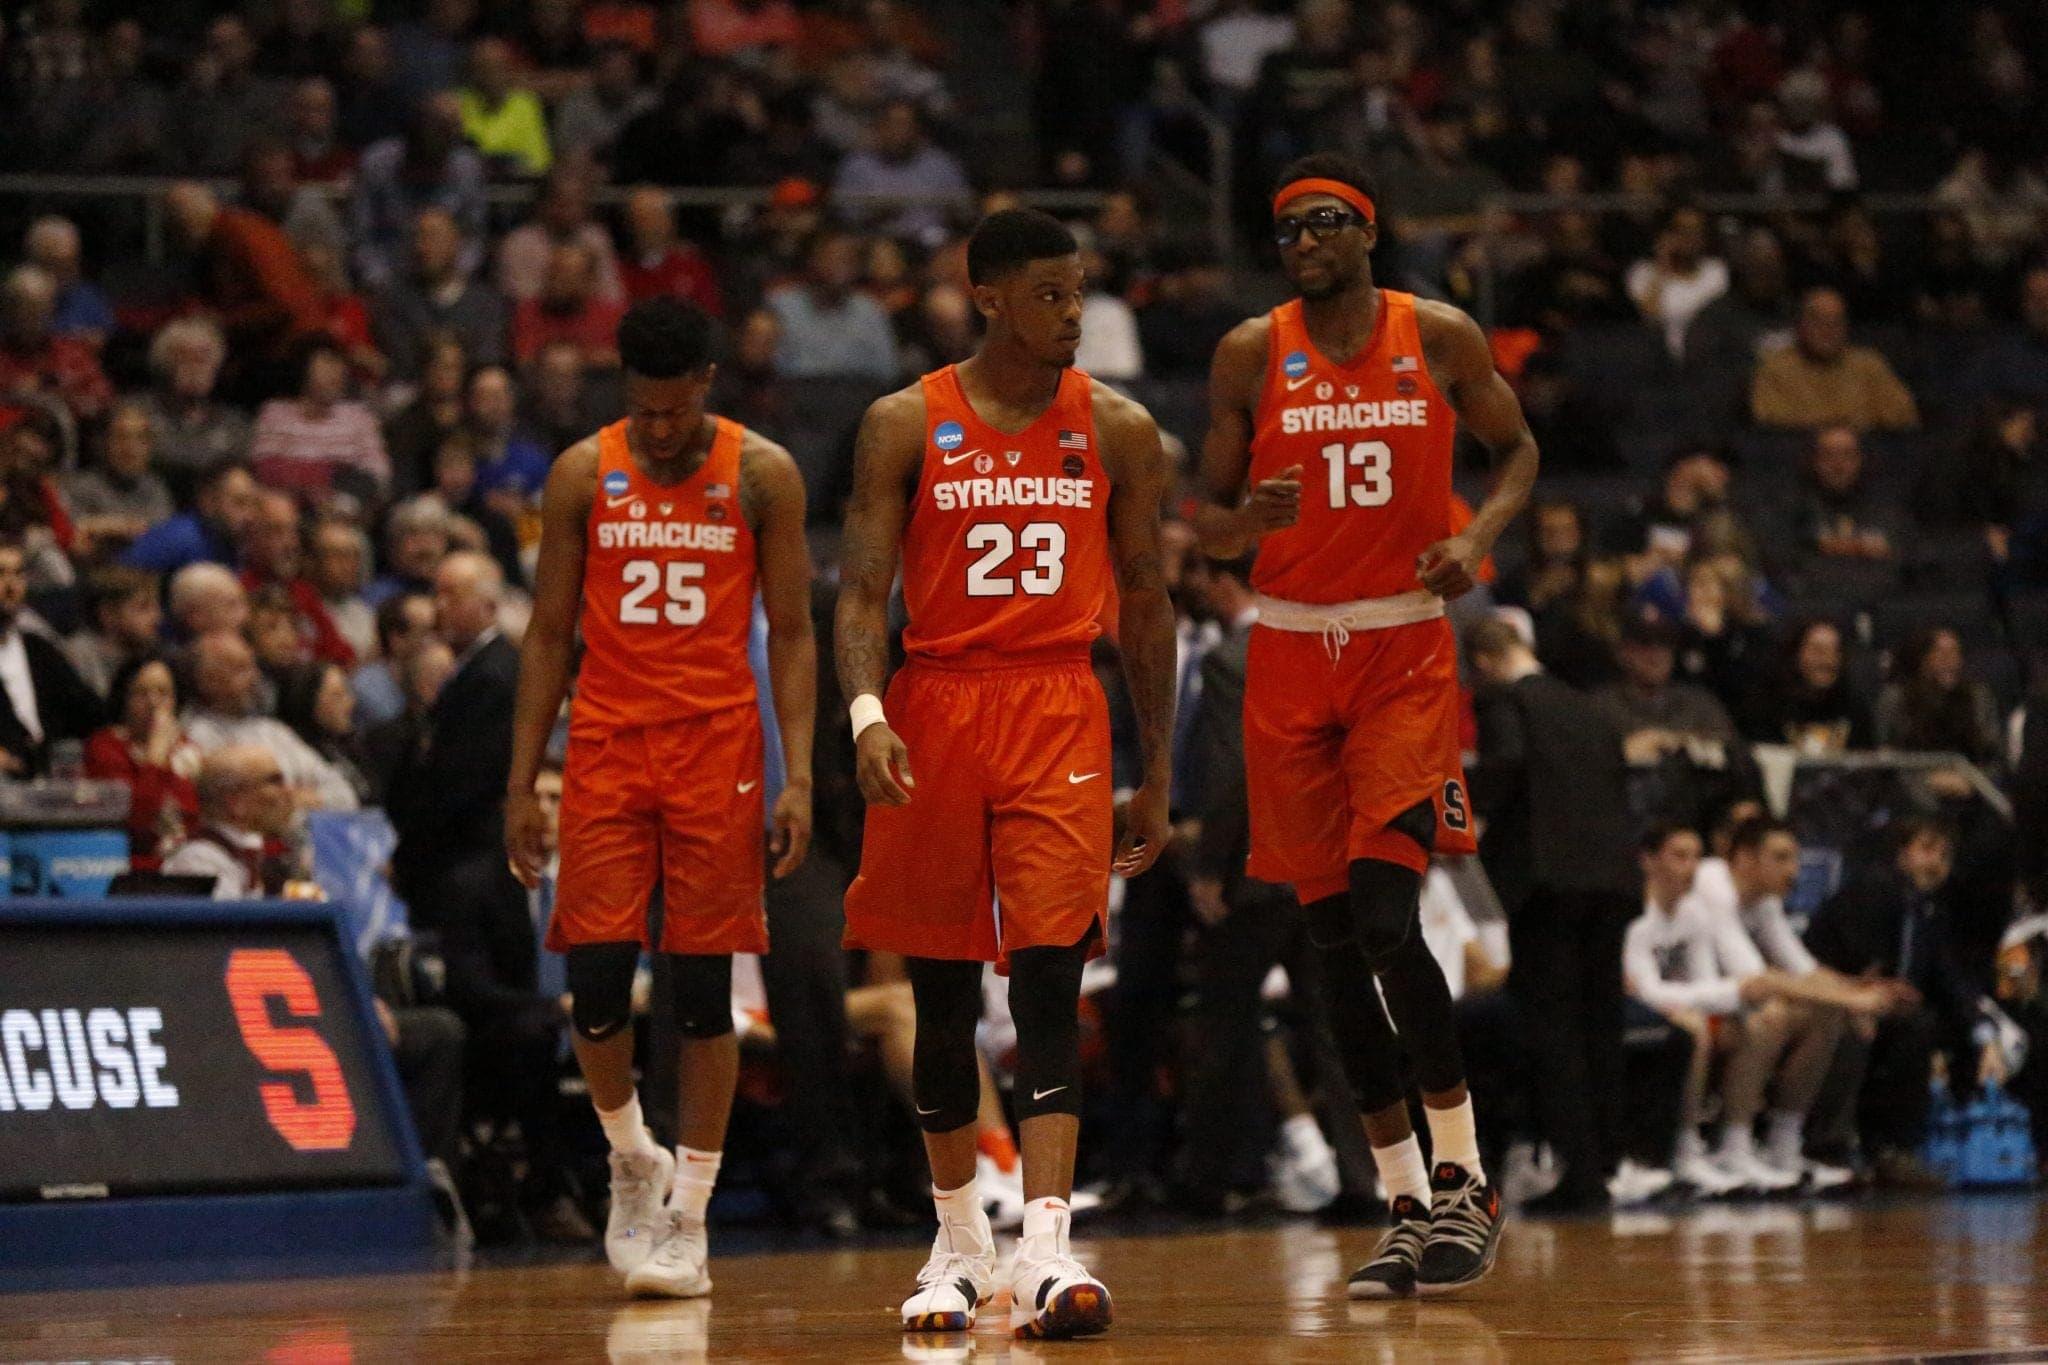 SU Orange starters during Syracuse's 60-56 win versus Arizona State